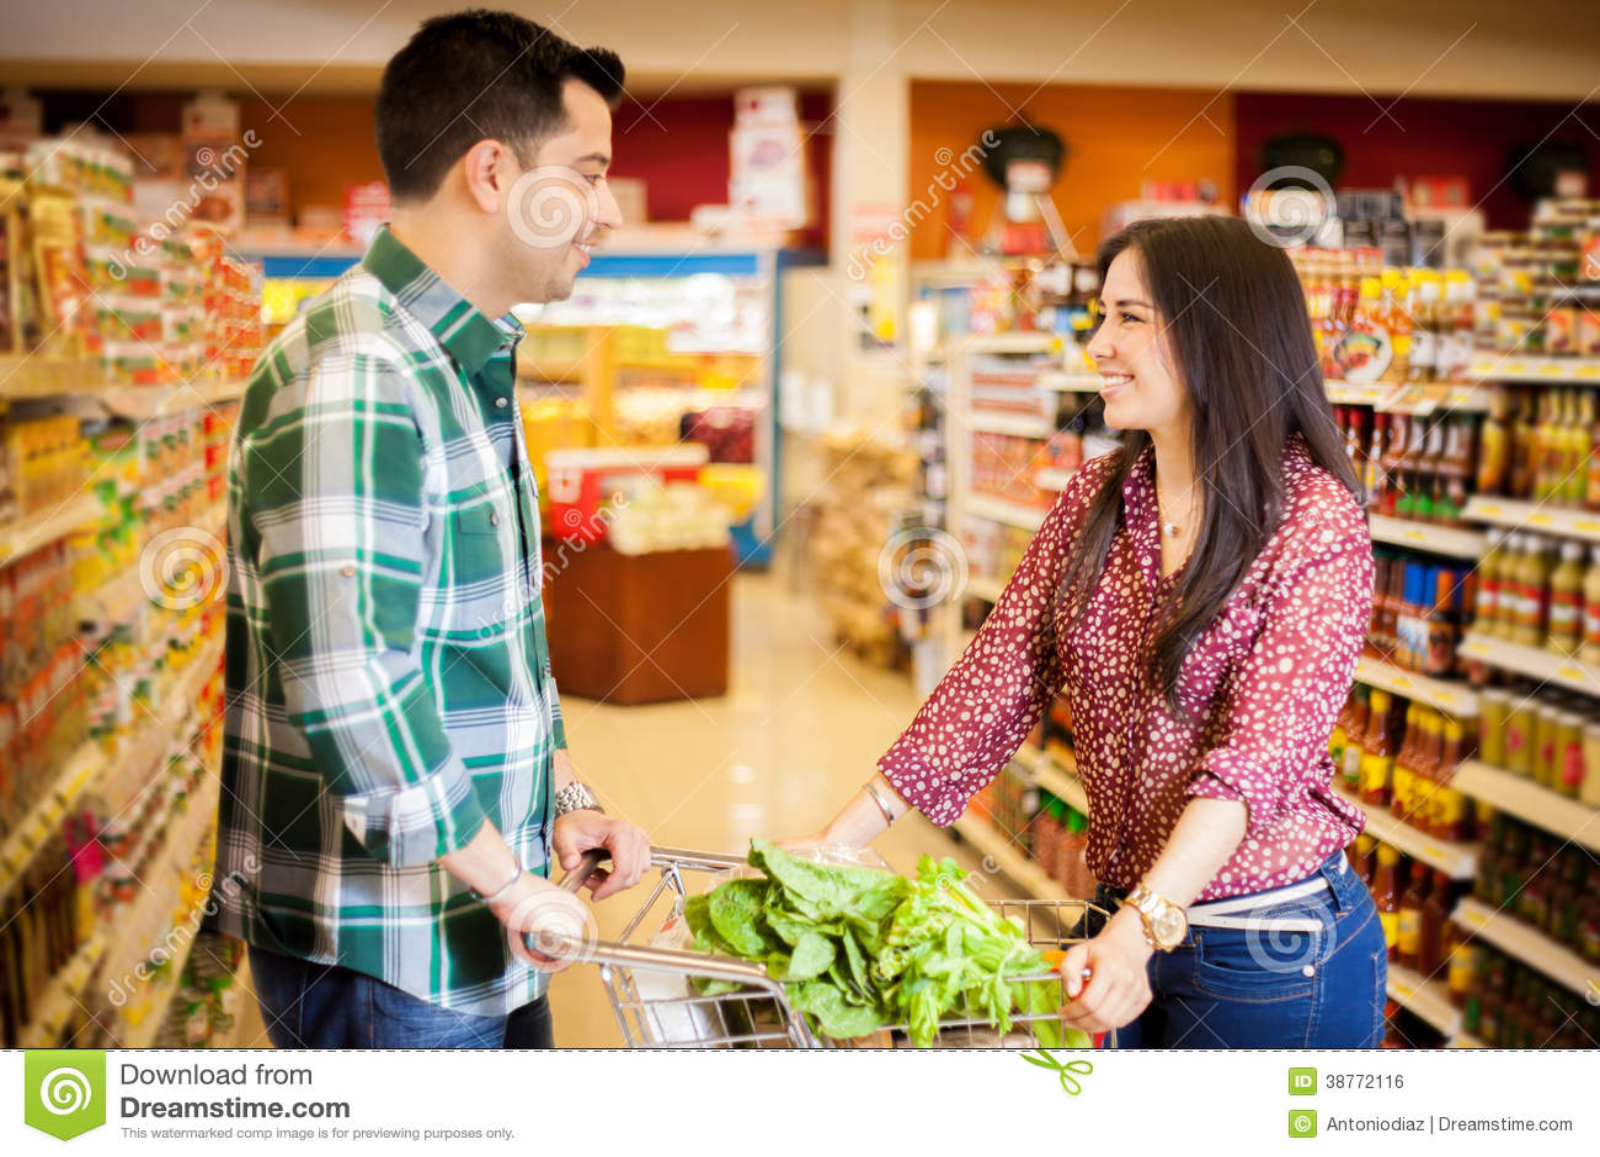 Flirten im Supermarkt- blogger.com bei RTL Explosiv - Flirt University